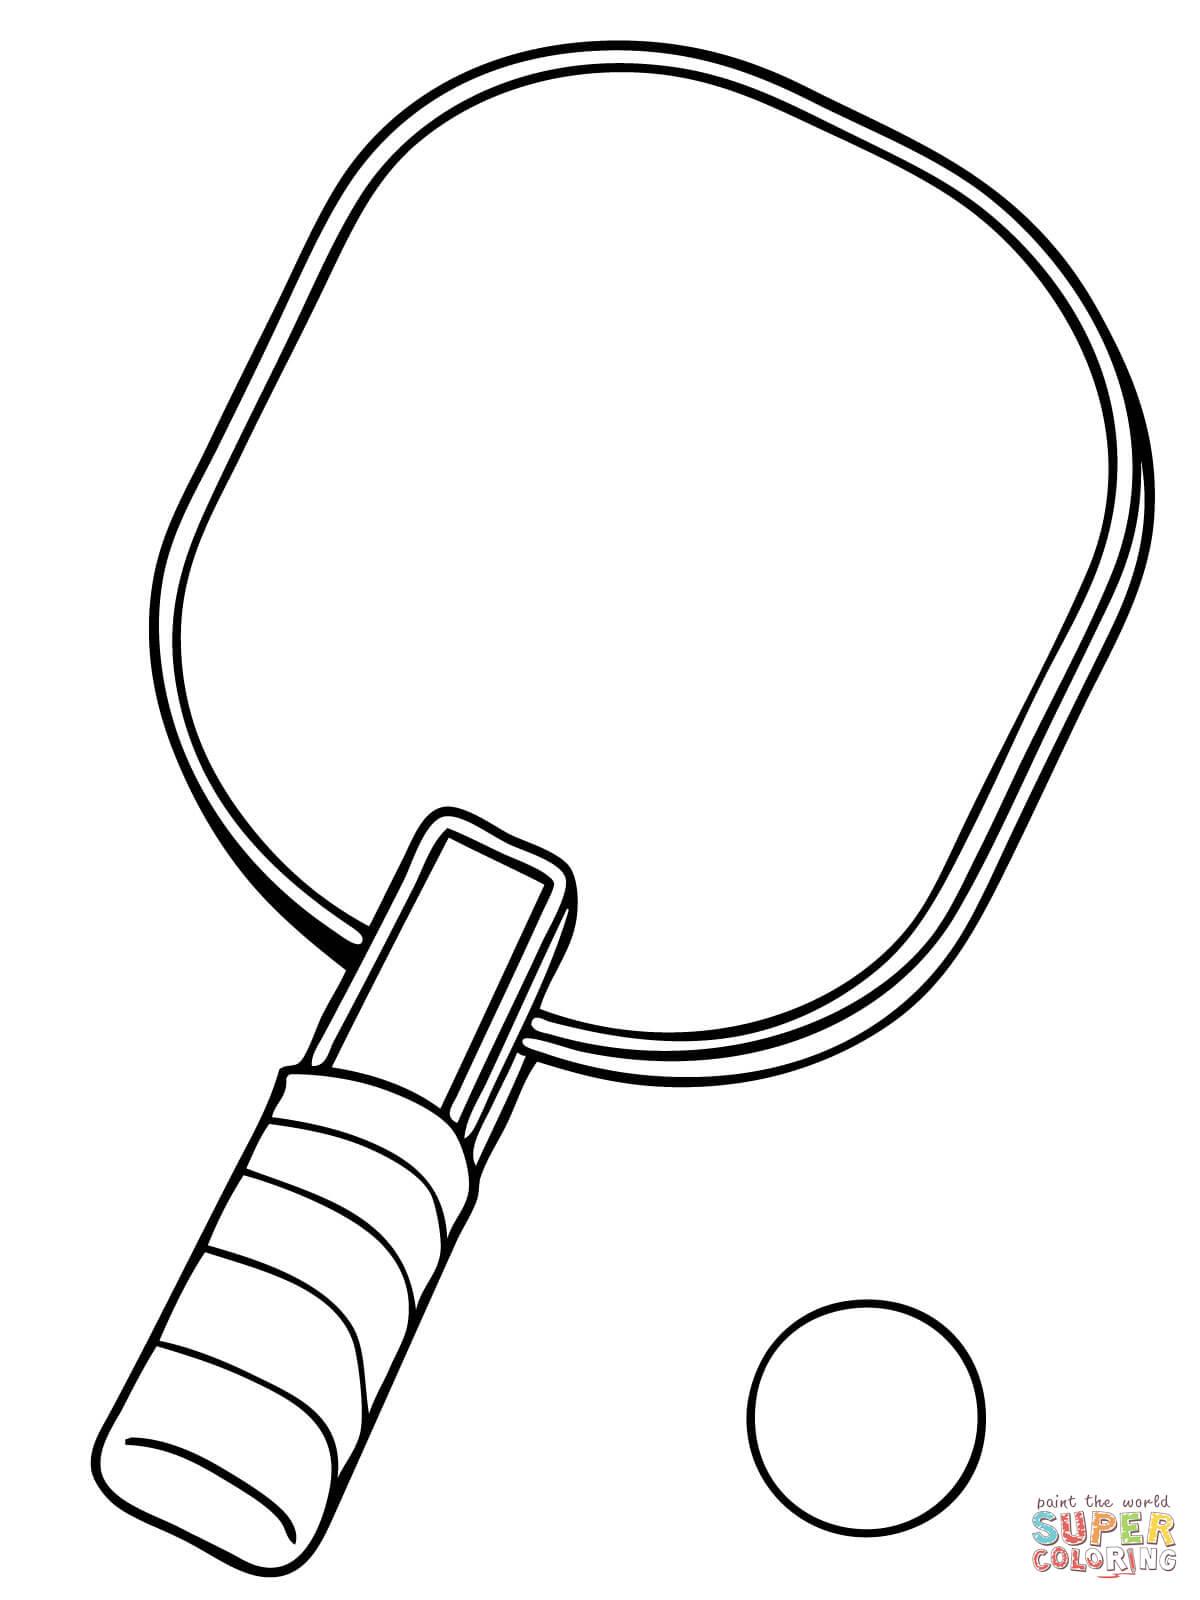 Dibujo de Paleta y Pelota de Tenis de Mesa para colorear